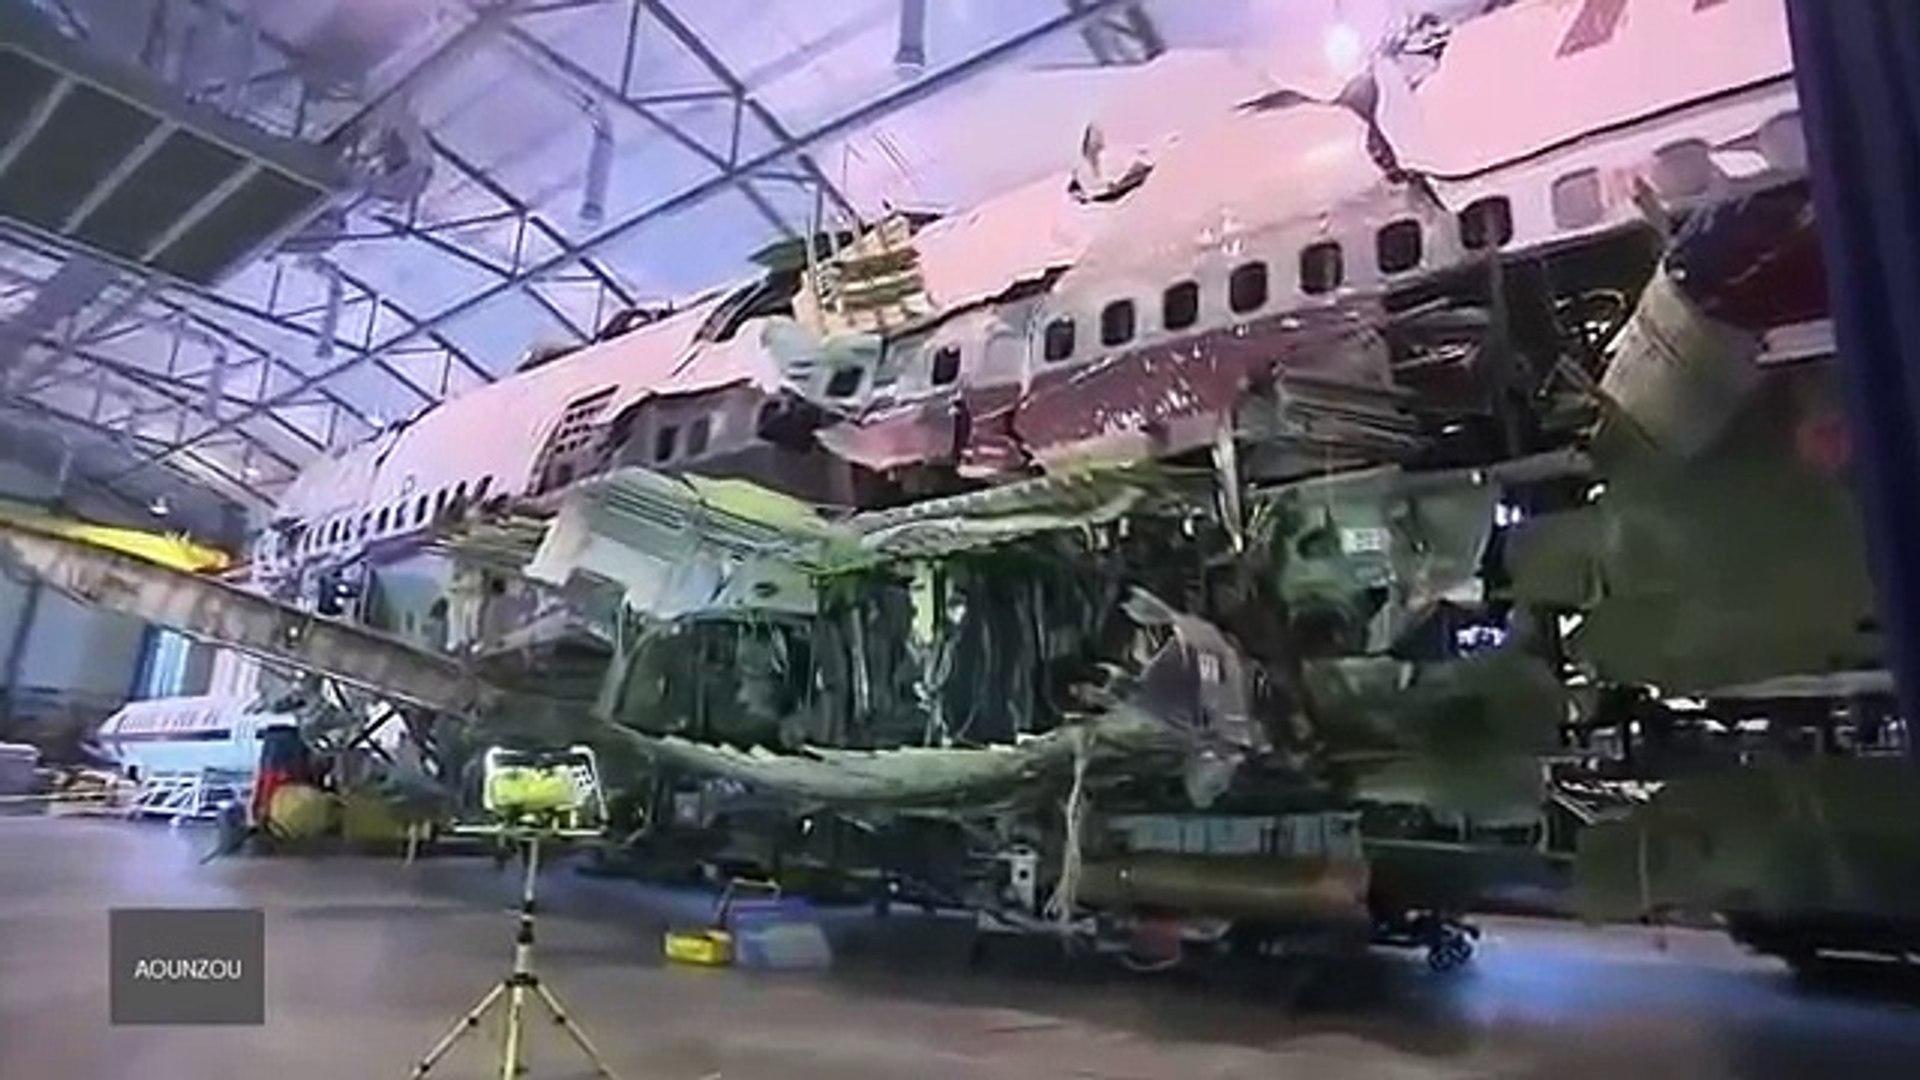 Air CRASH investigation 2016 NEW SERIE - FATAL FLAWS